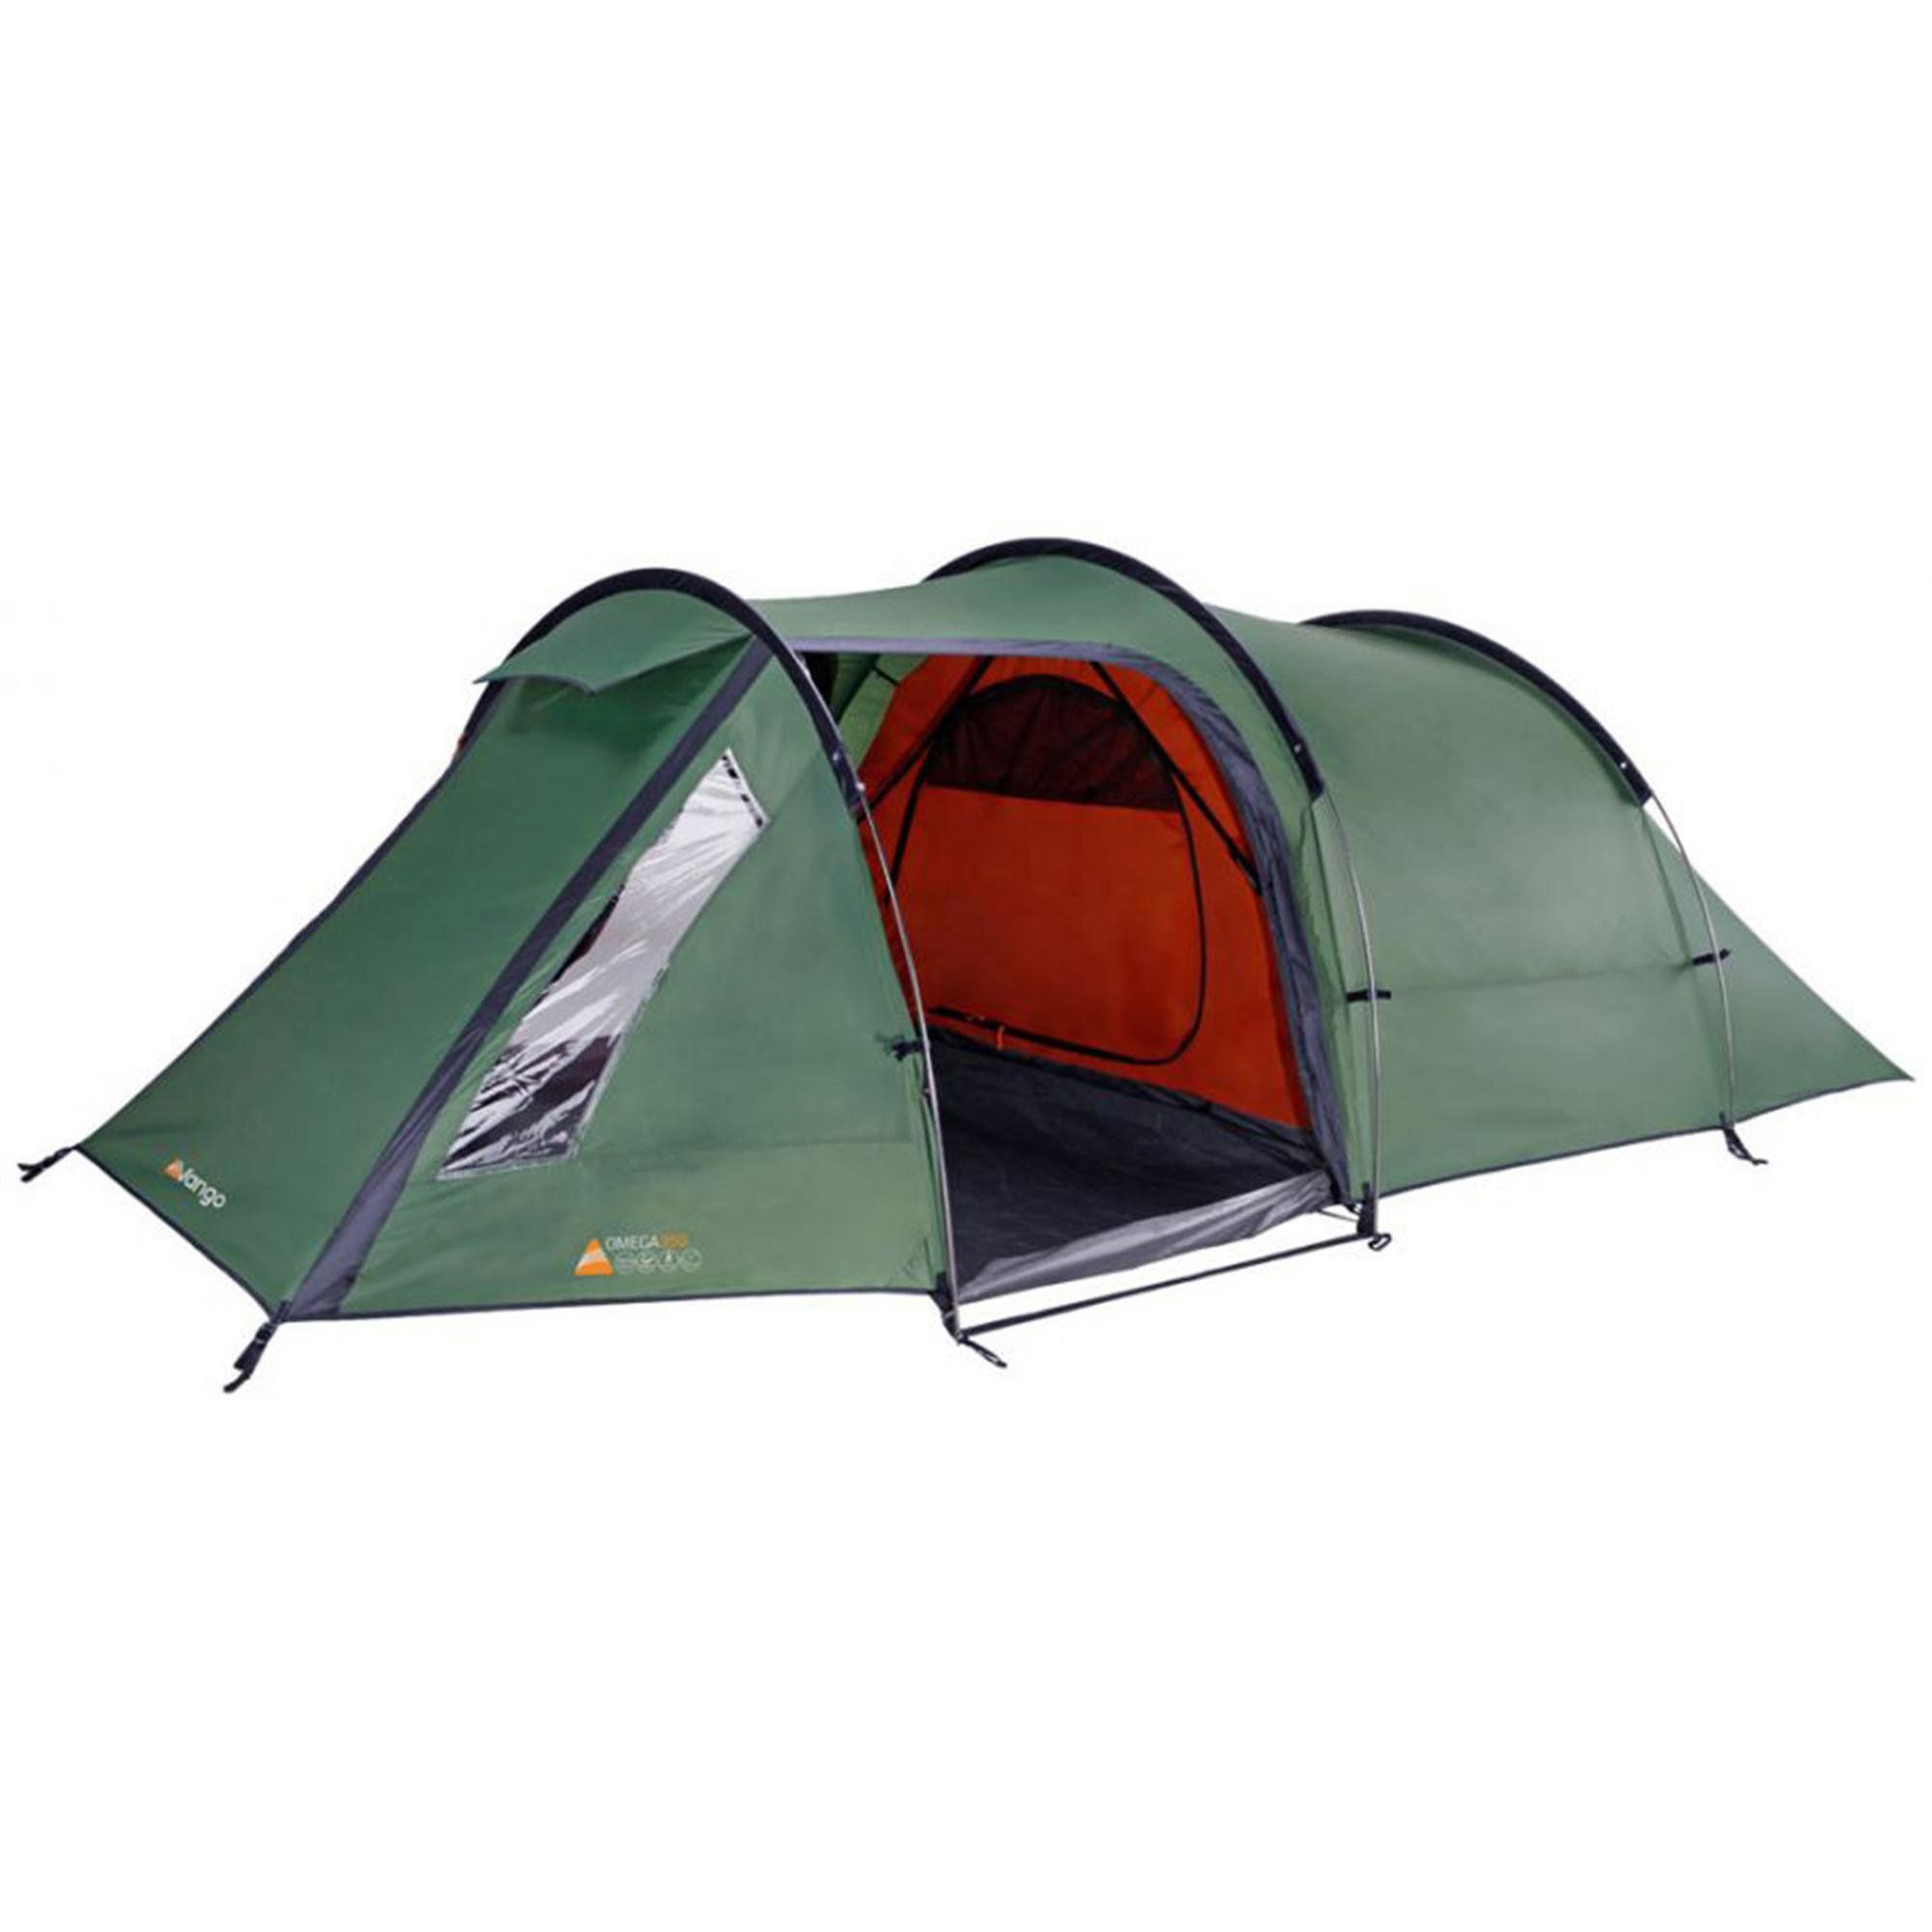 VANGO Omega 350 3 Man Technical Tent